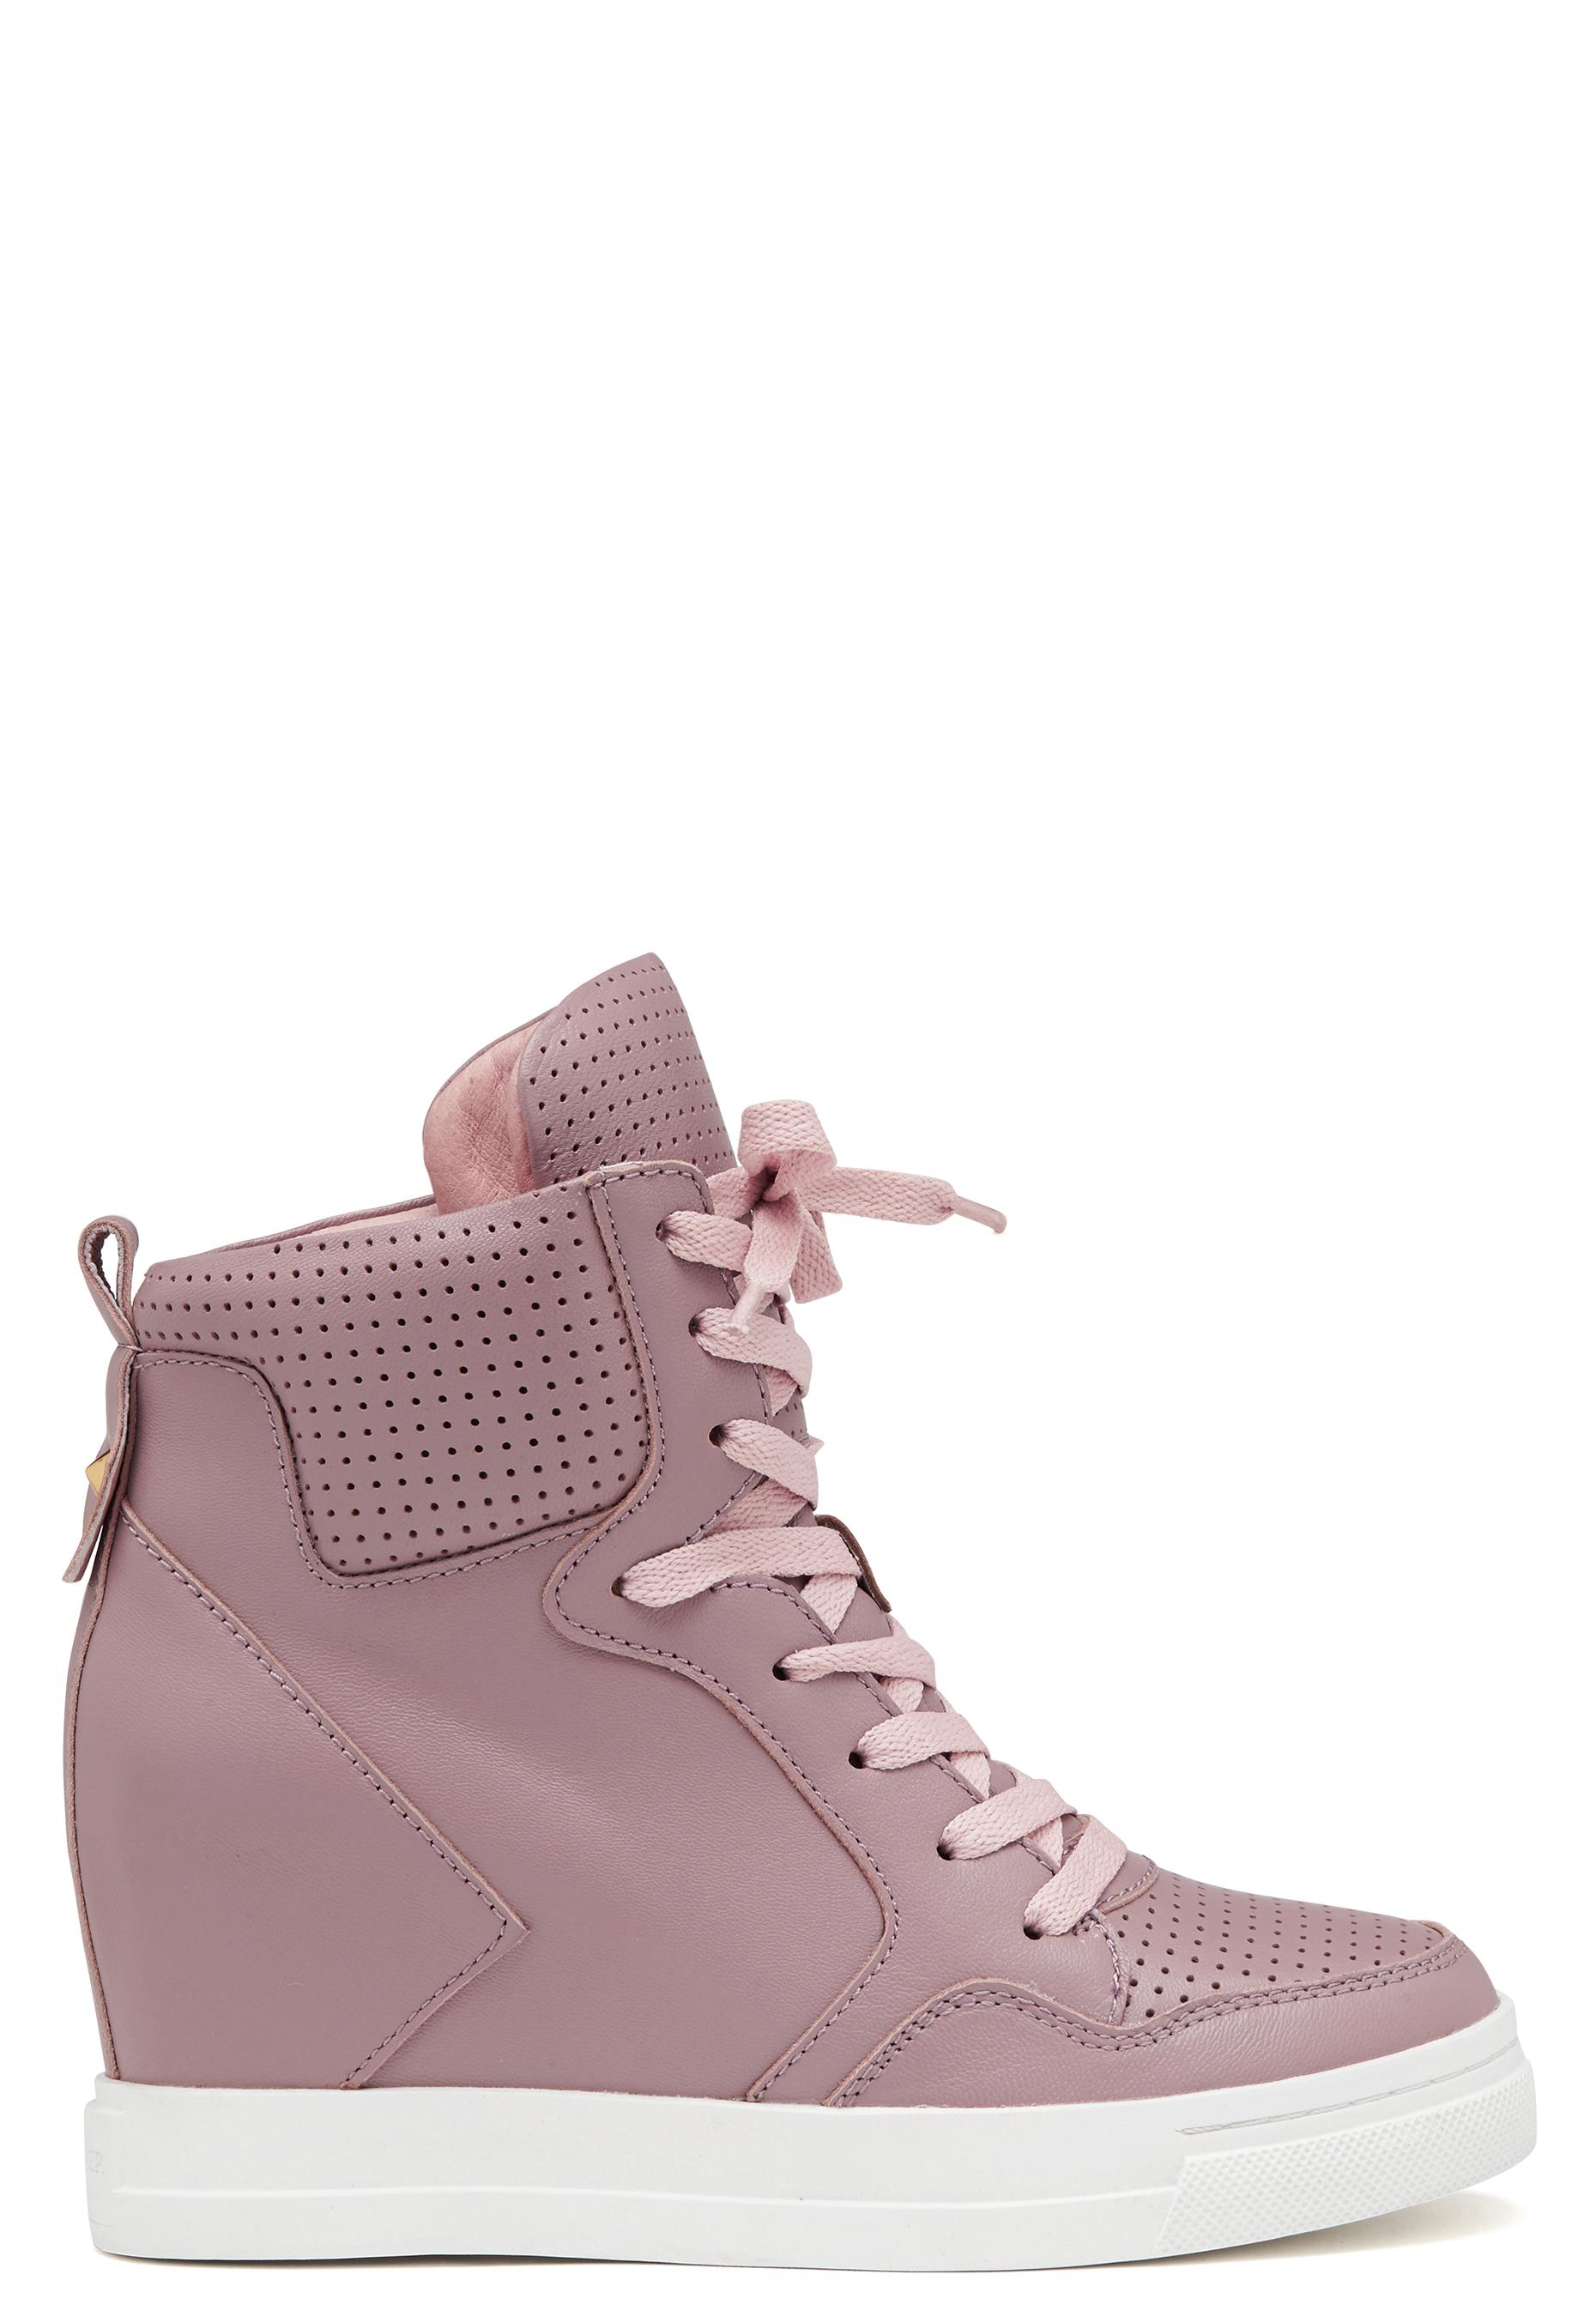 Shoes Nude Parker Uma Bubbleroom Boston 5RL4Aj